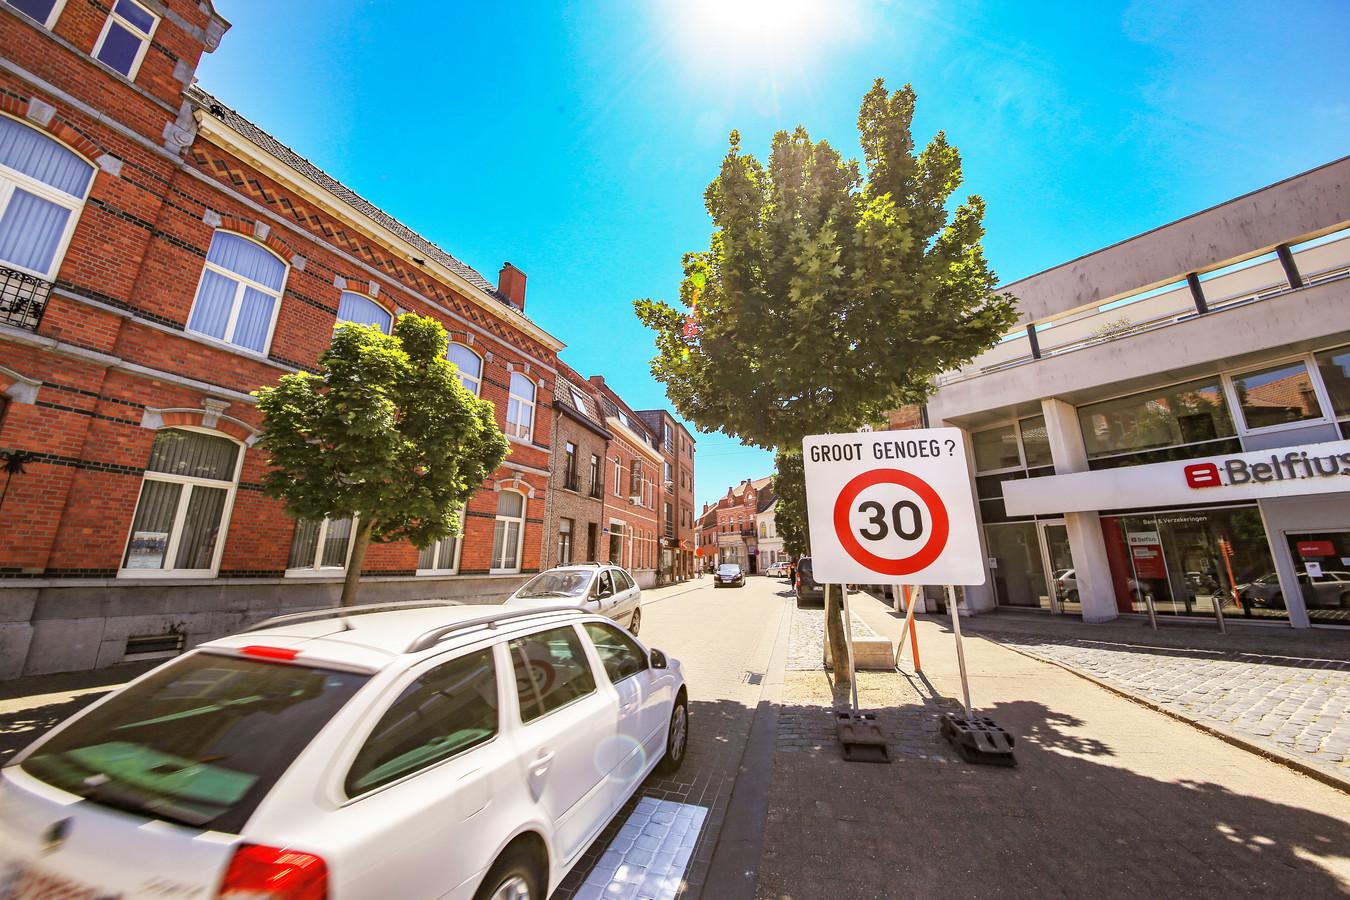 In de Vlamingenstraat stond zo'n groot waarschuwingsbord